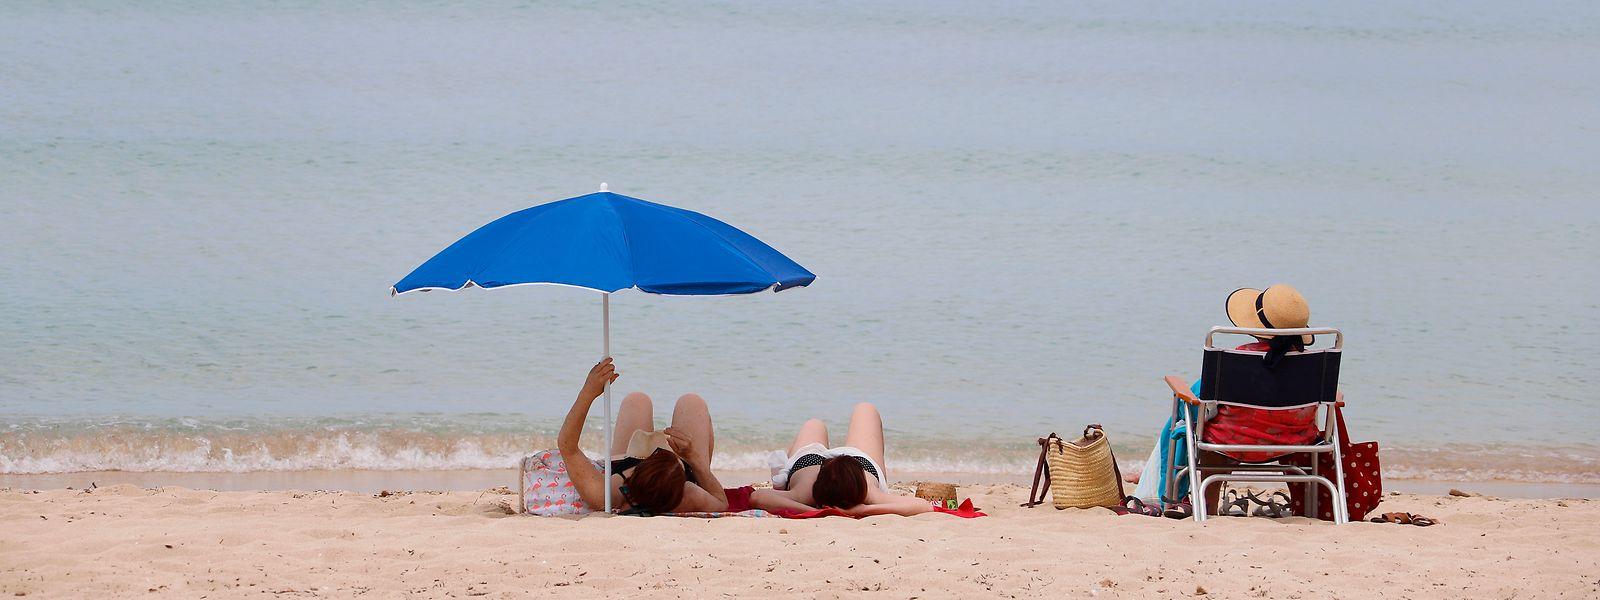 Palma de Mallorca: Menschen sonnen sich am Strand von Arenal.